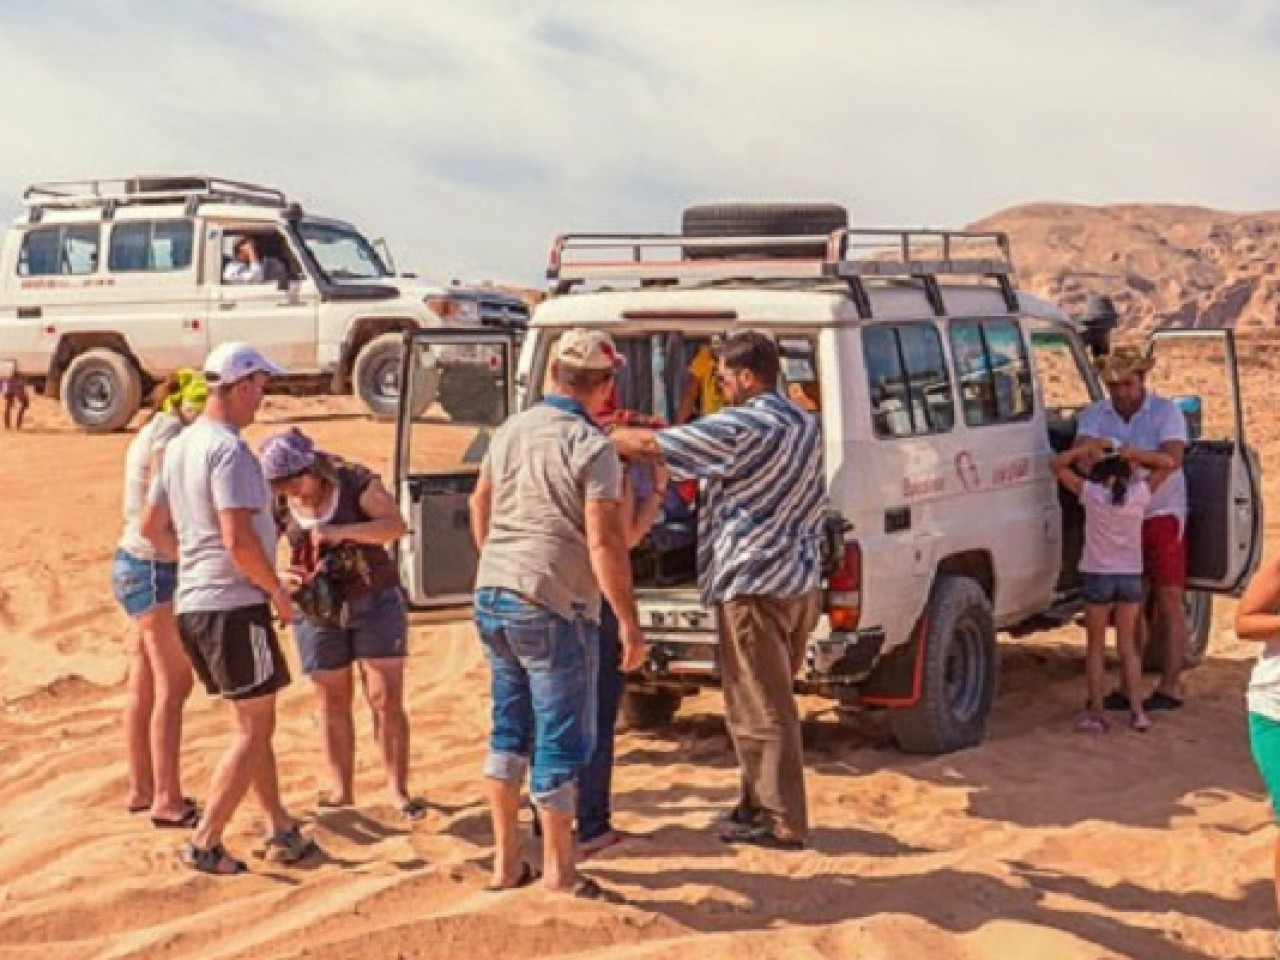 Jeep Safari, Camel Rides, and Bedouin Village BBQ